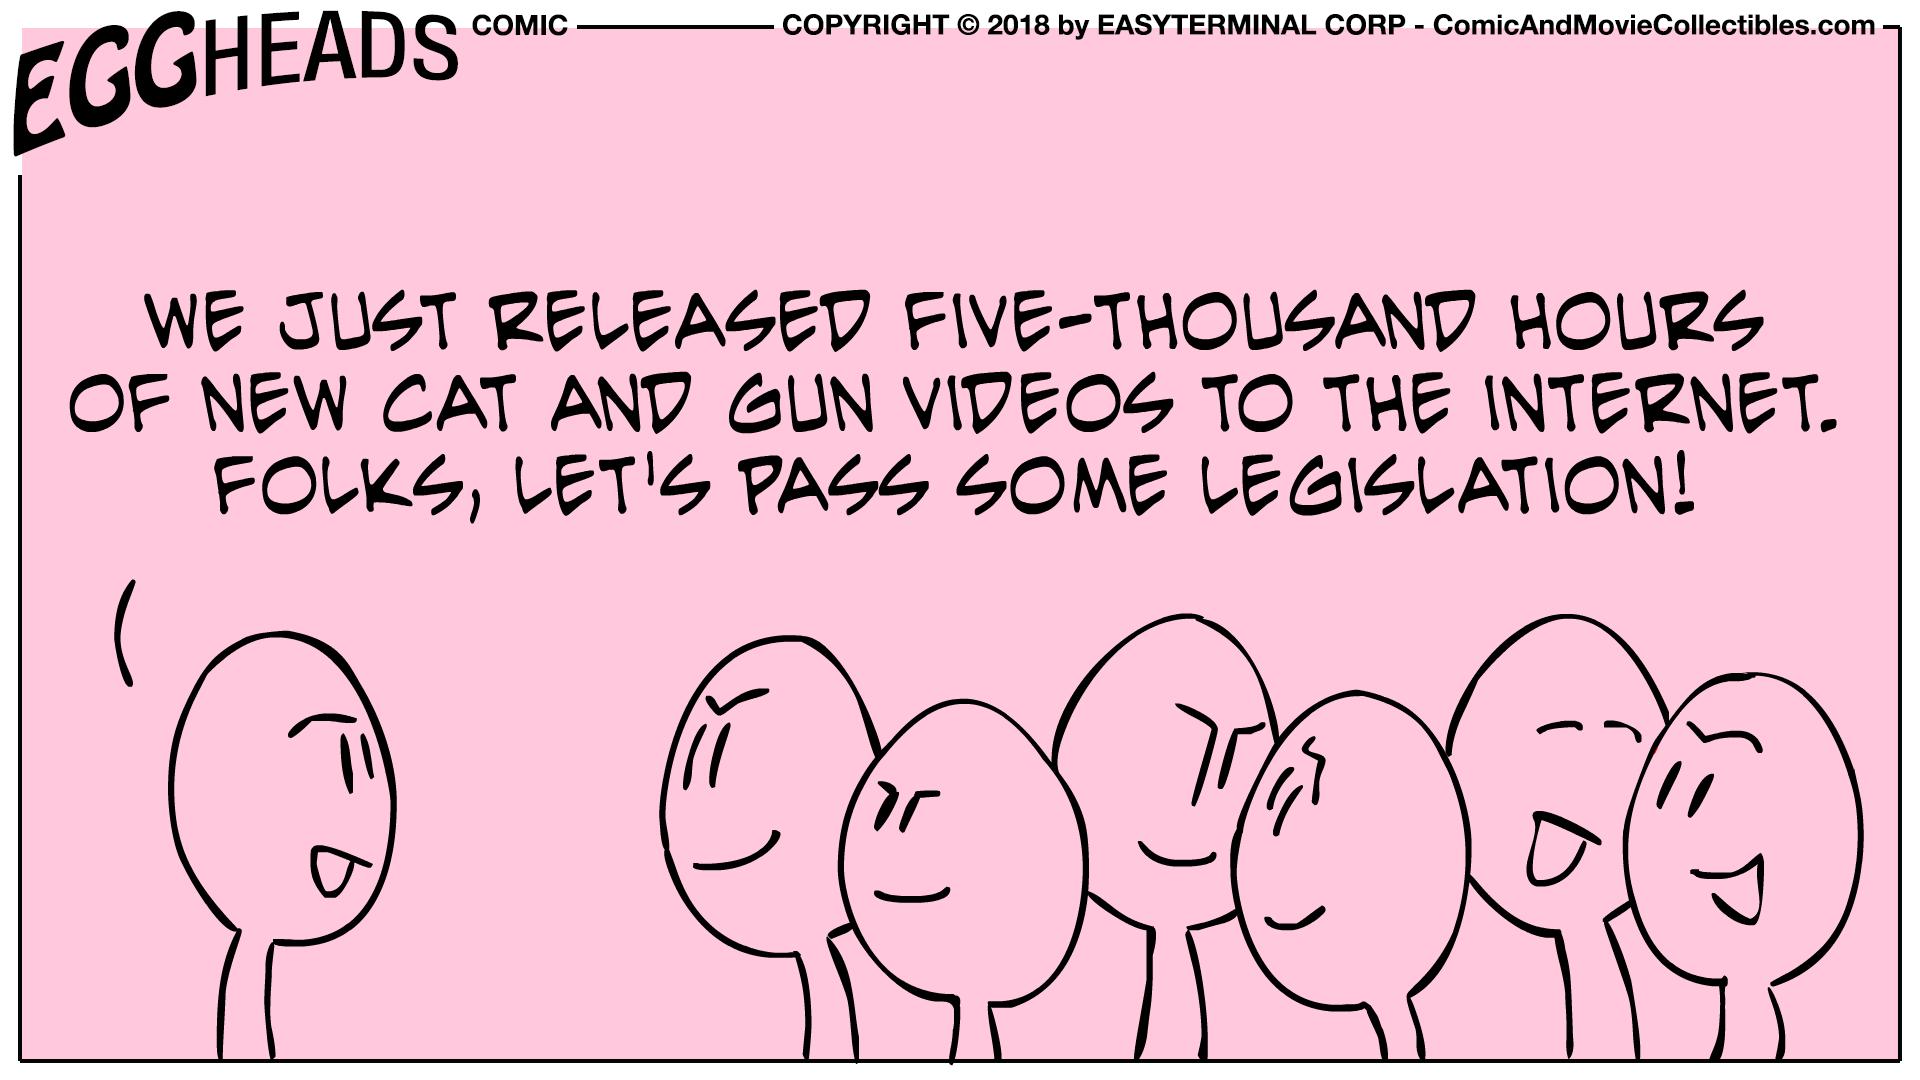 Webcomic Eggheads Comic Strip 026 Five-Thousand Hours